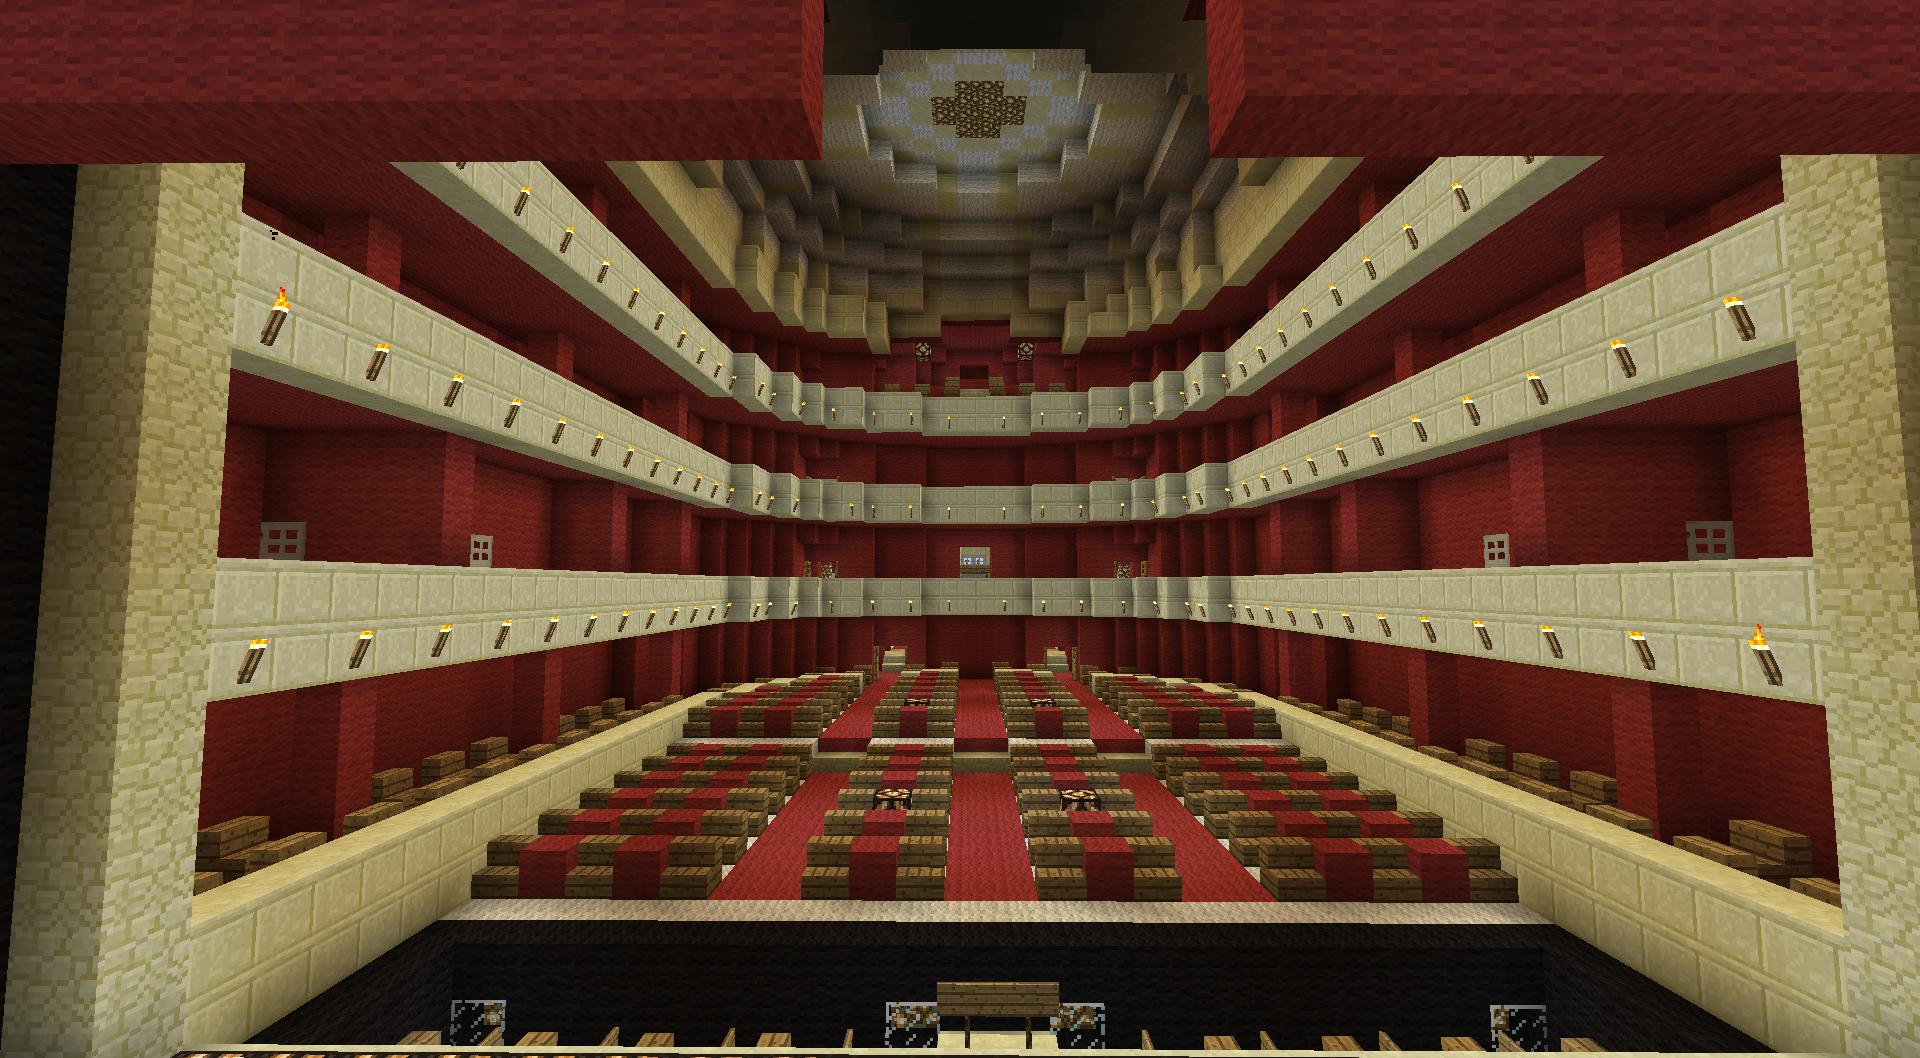 Opera House Inspired By Royal Opera House Screenshots